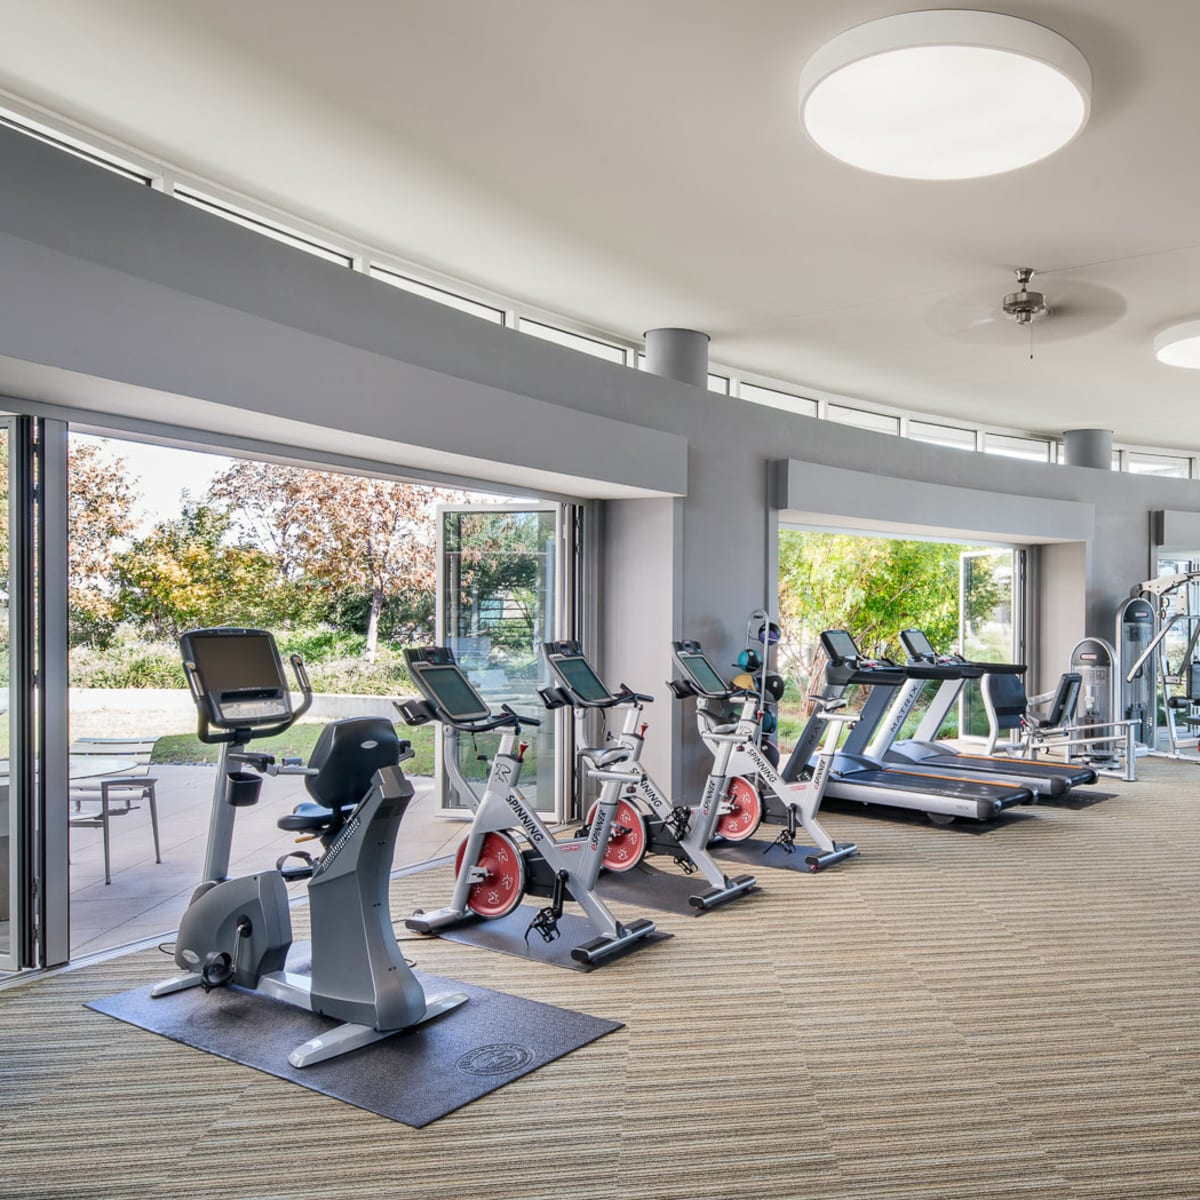 Fitness center at AMLI Design District